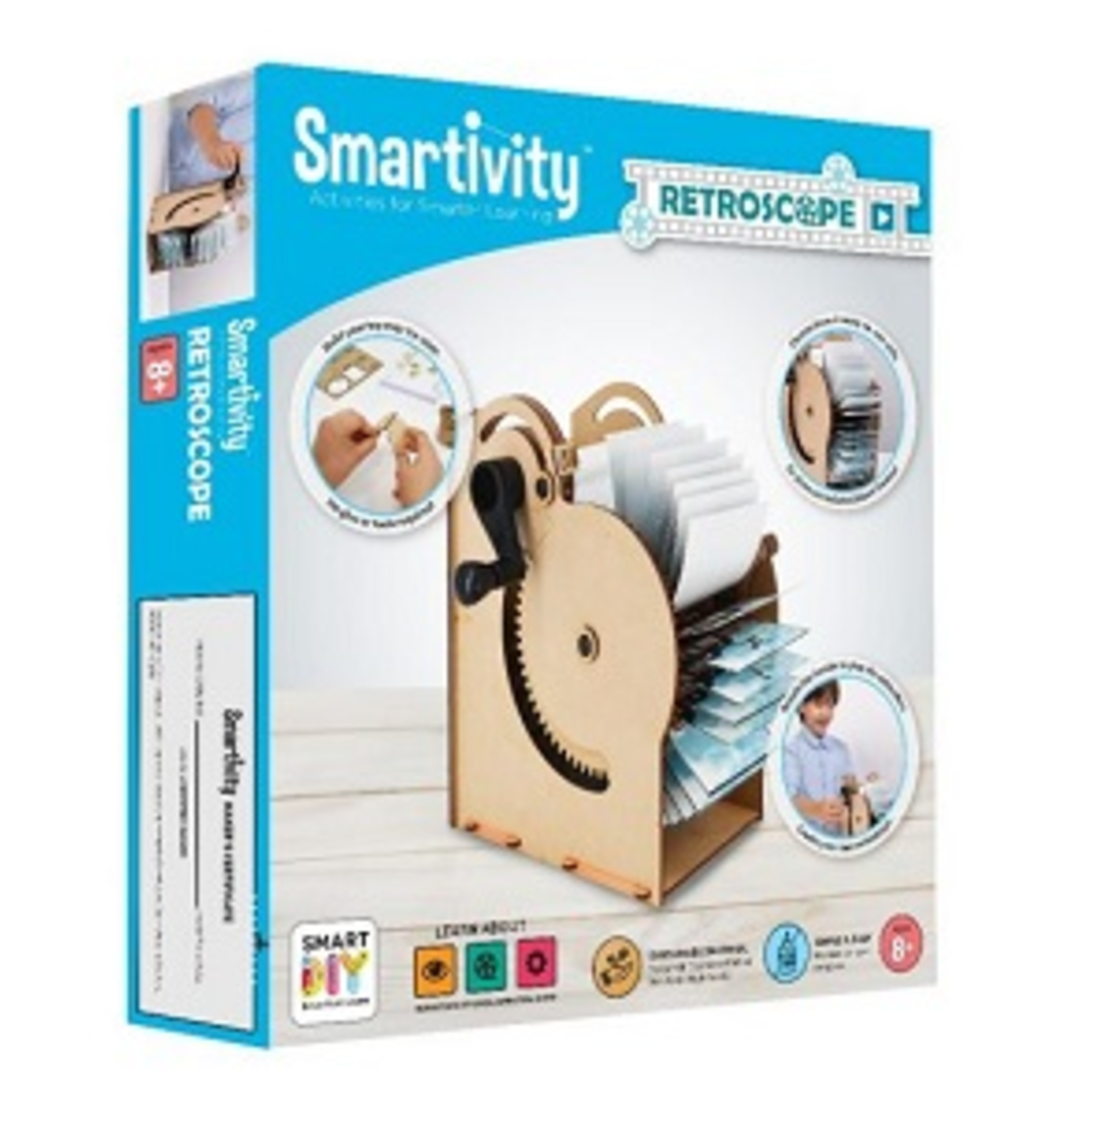 Smartivity - Retroscope Movie Maker SMRT1014